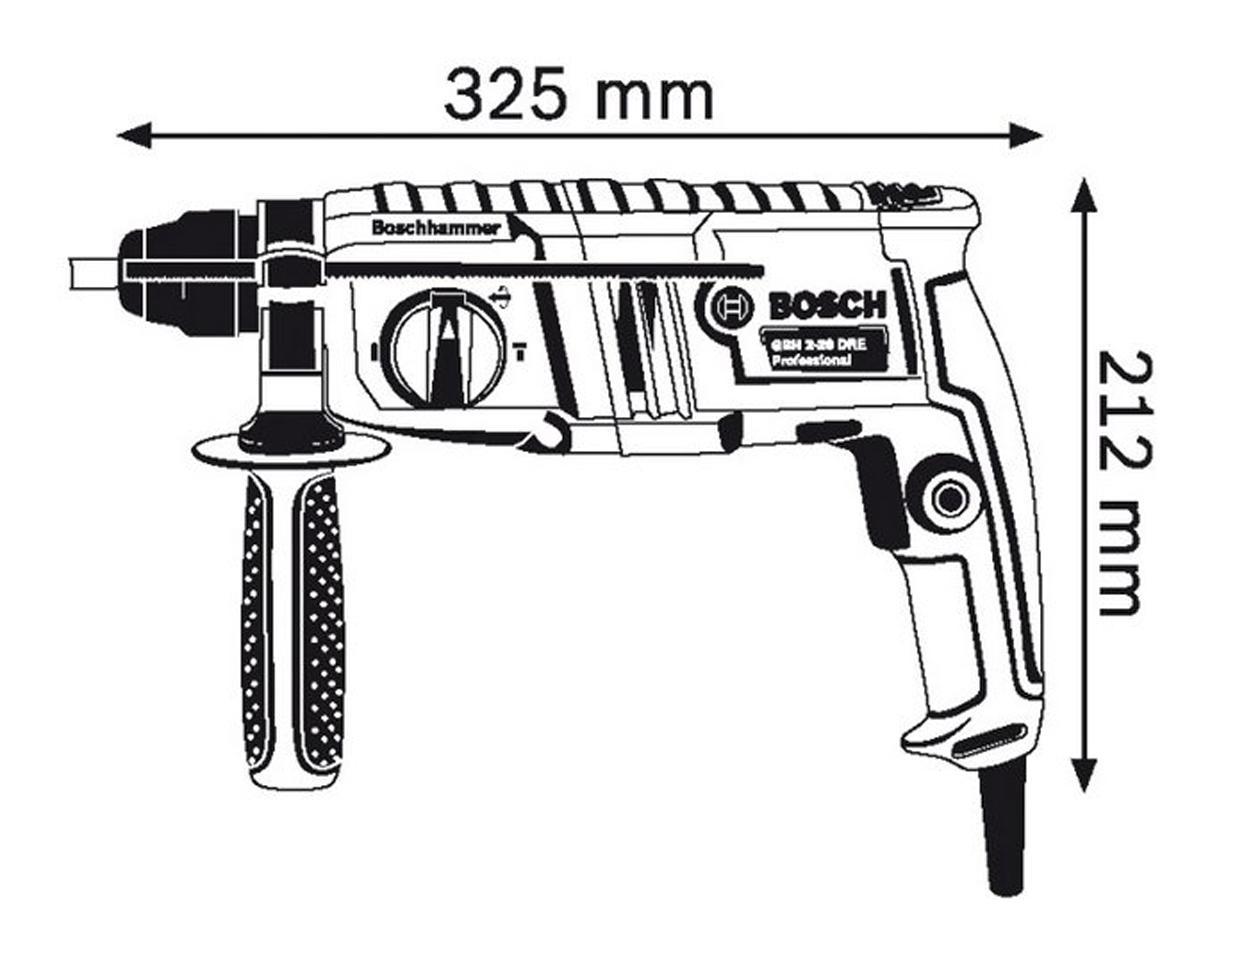 Cek Harga Baru Mesin Bor Demoliton Rotary Hammer Bosch Gbh 2 20 Dre 18 Re Demolition 3